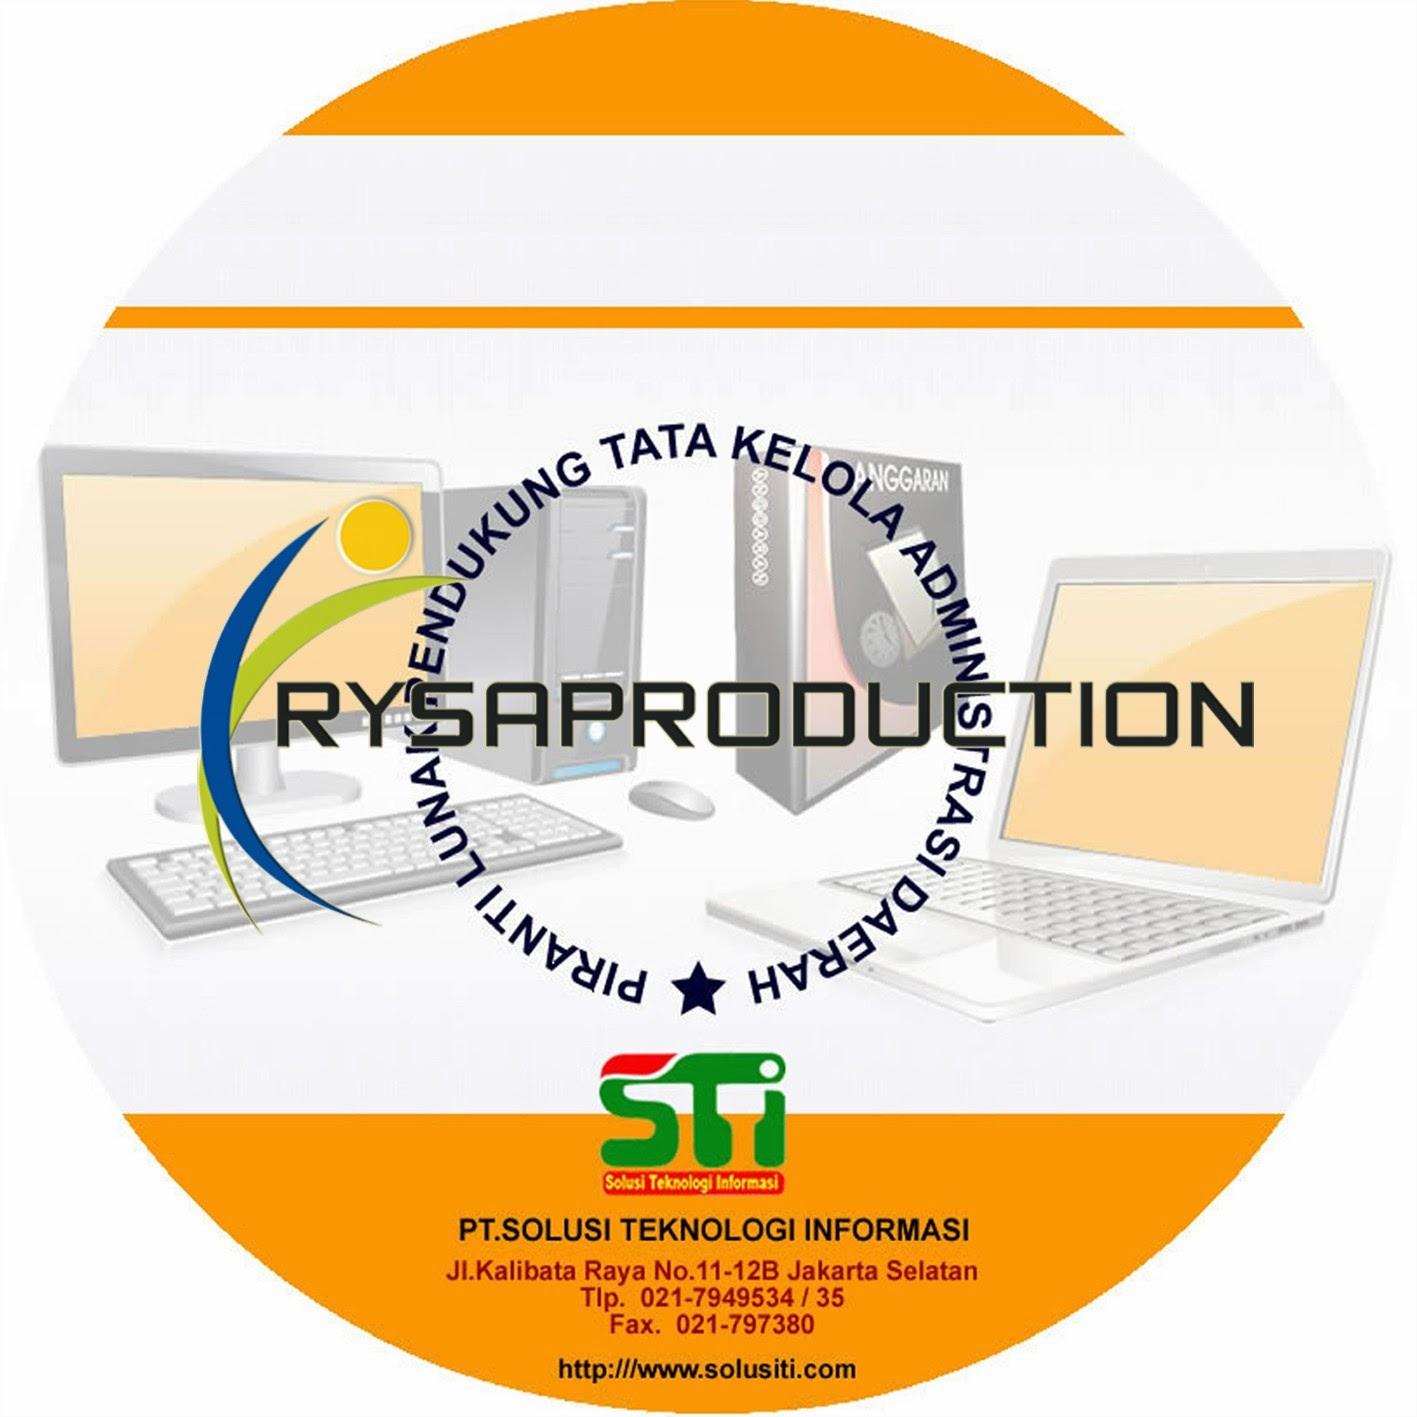 Solusi Teknologi Informasi